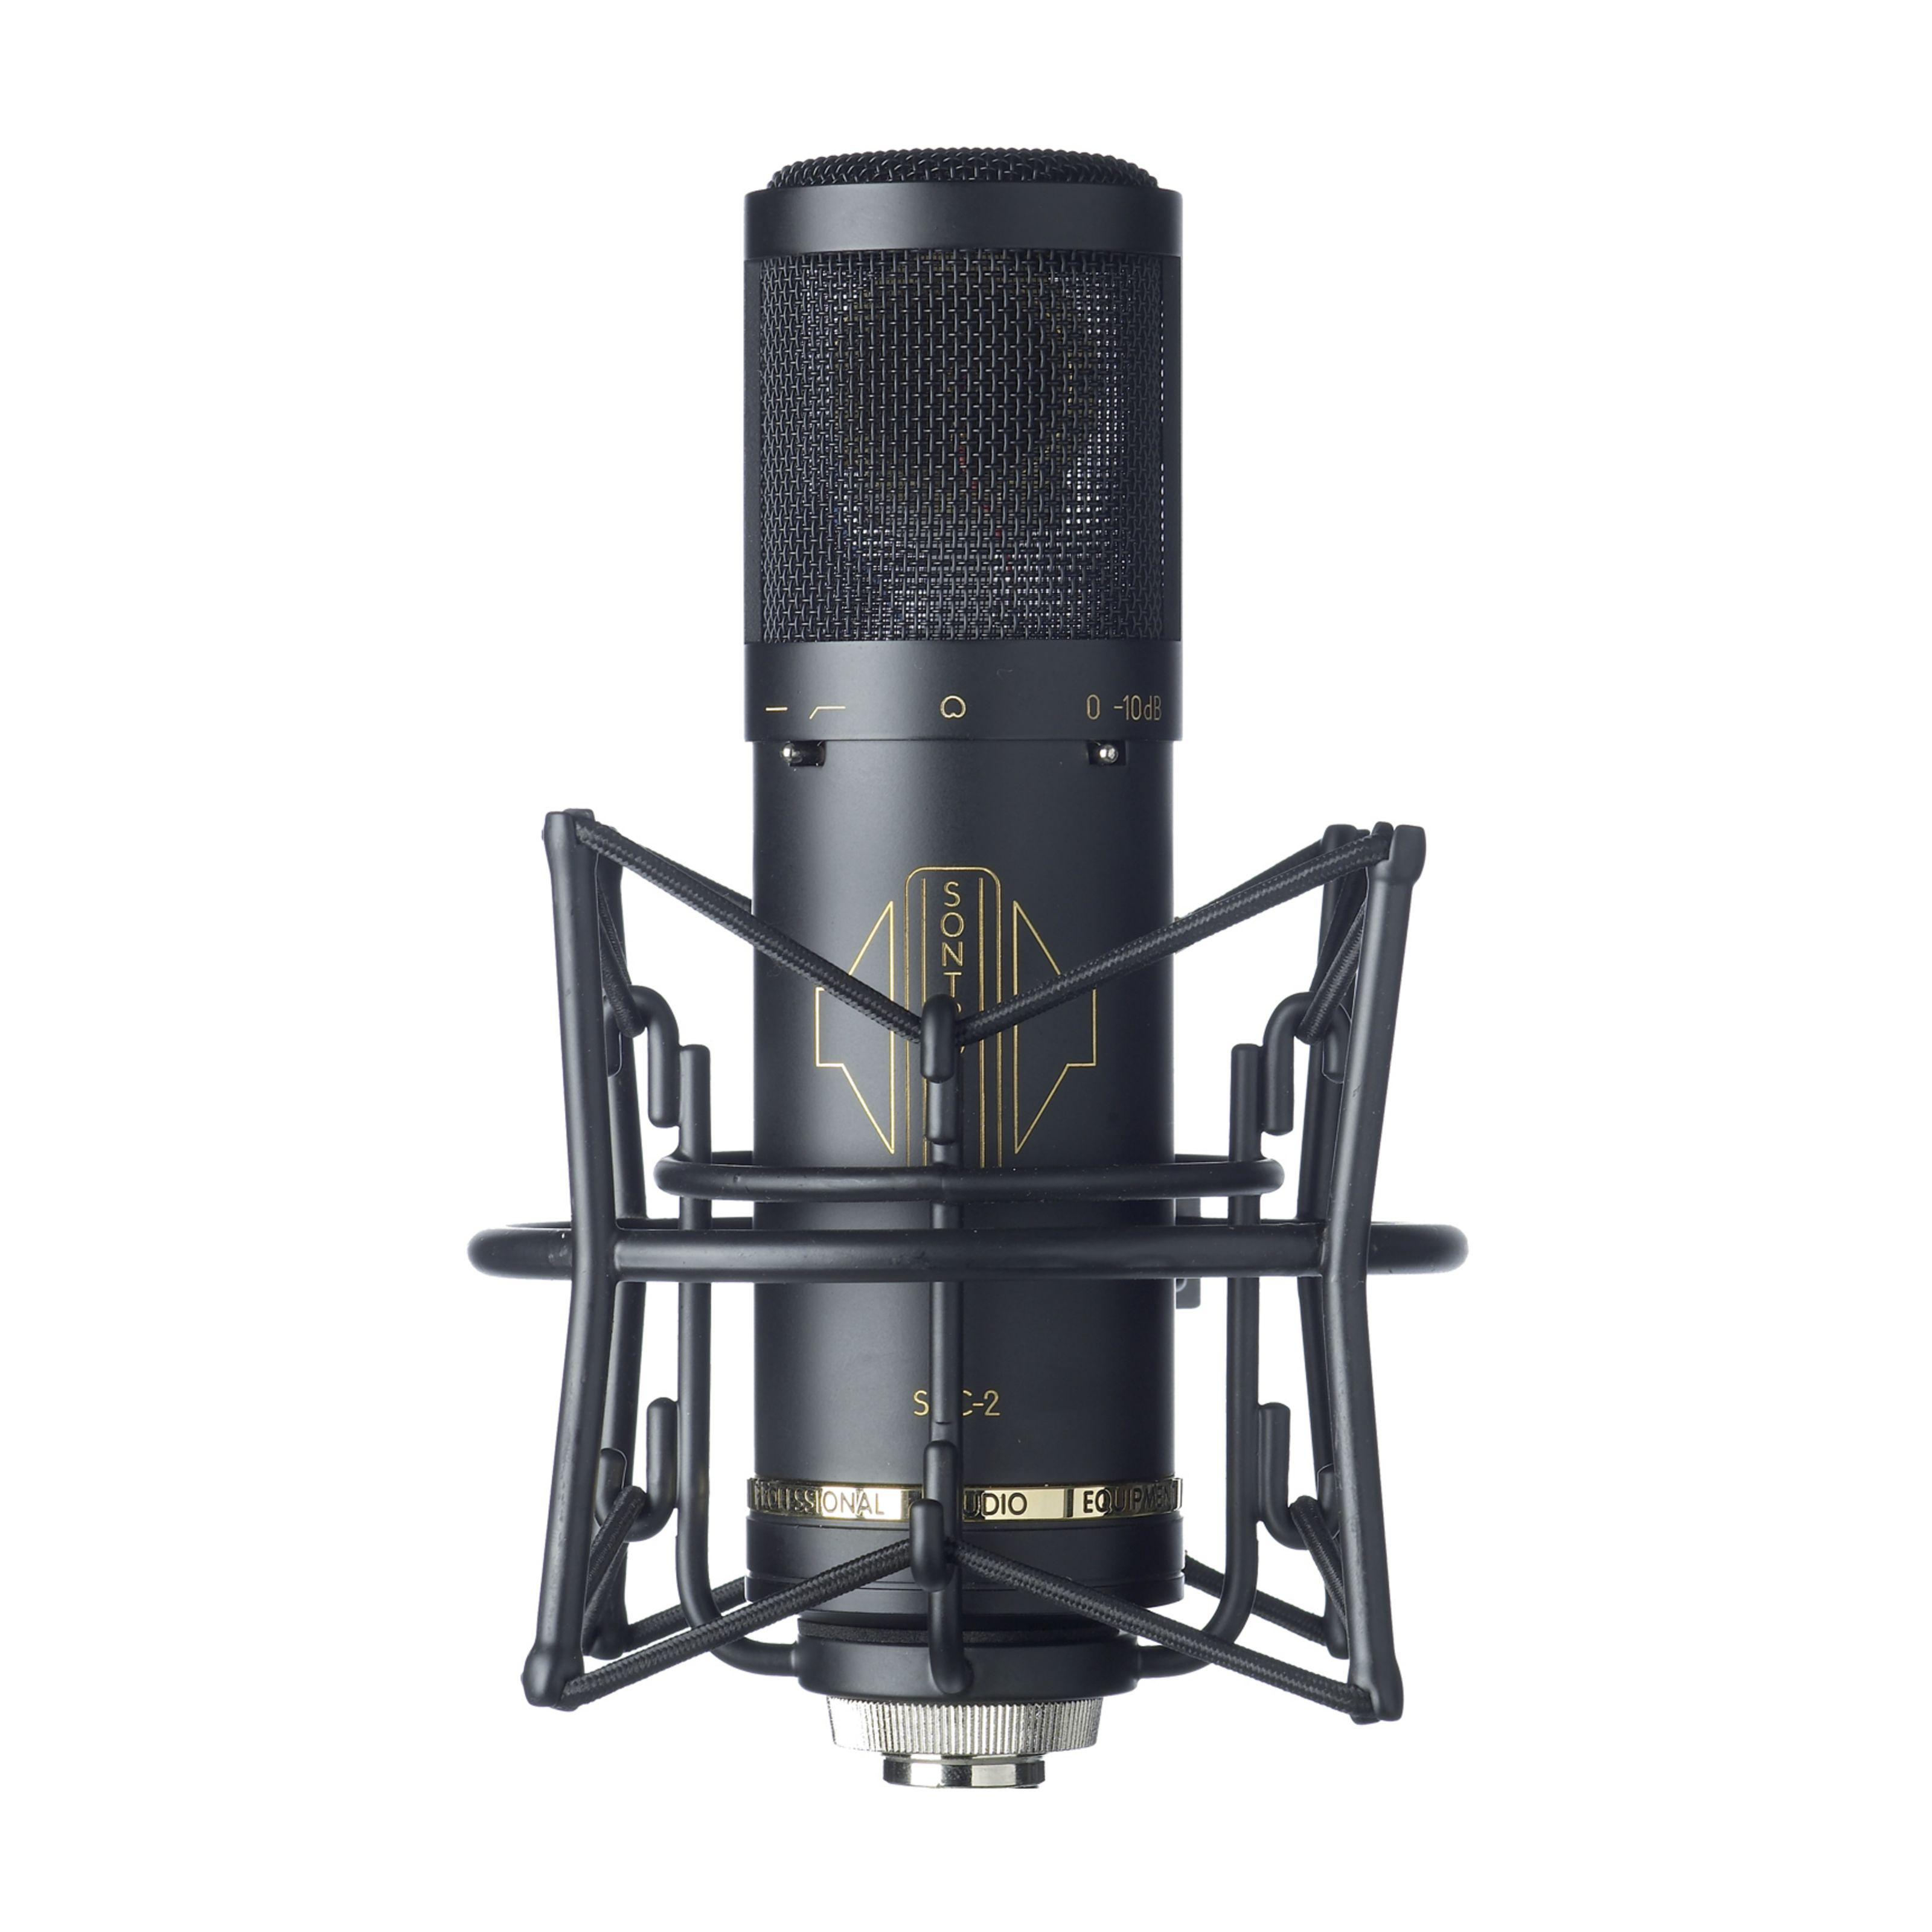 Sontronics - STC-2 Schwarz Großmembranmikro, Niere